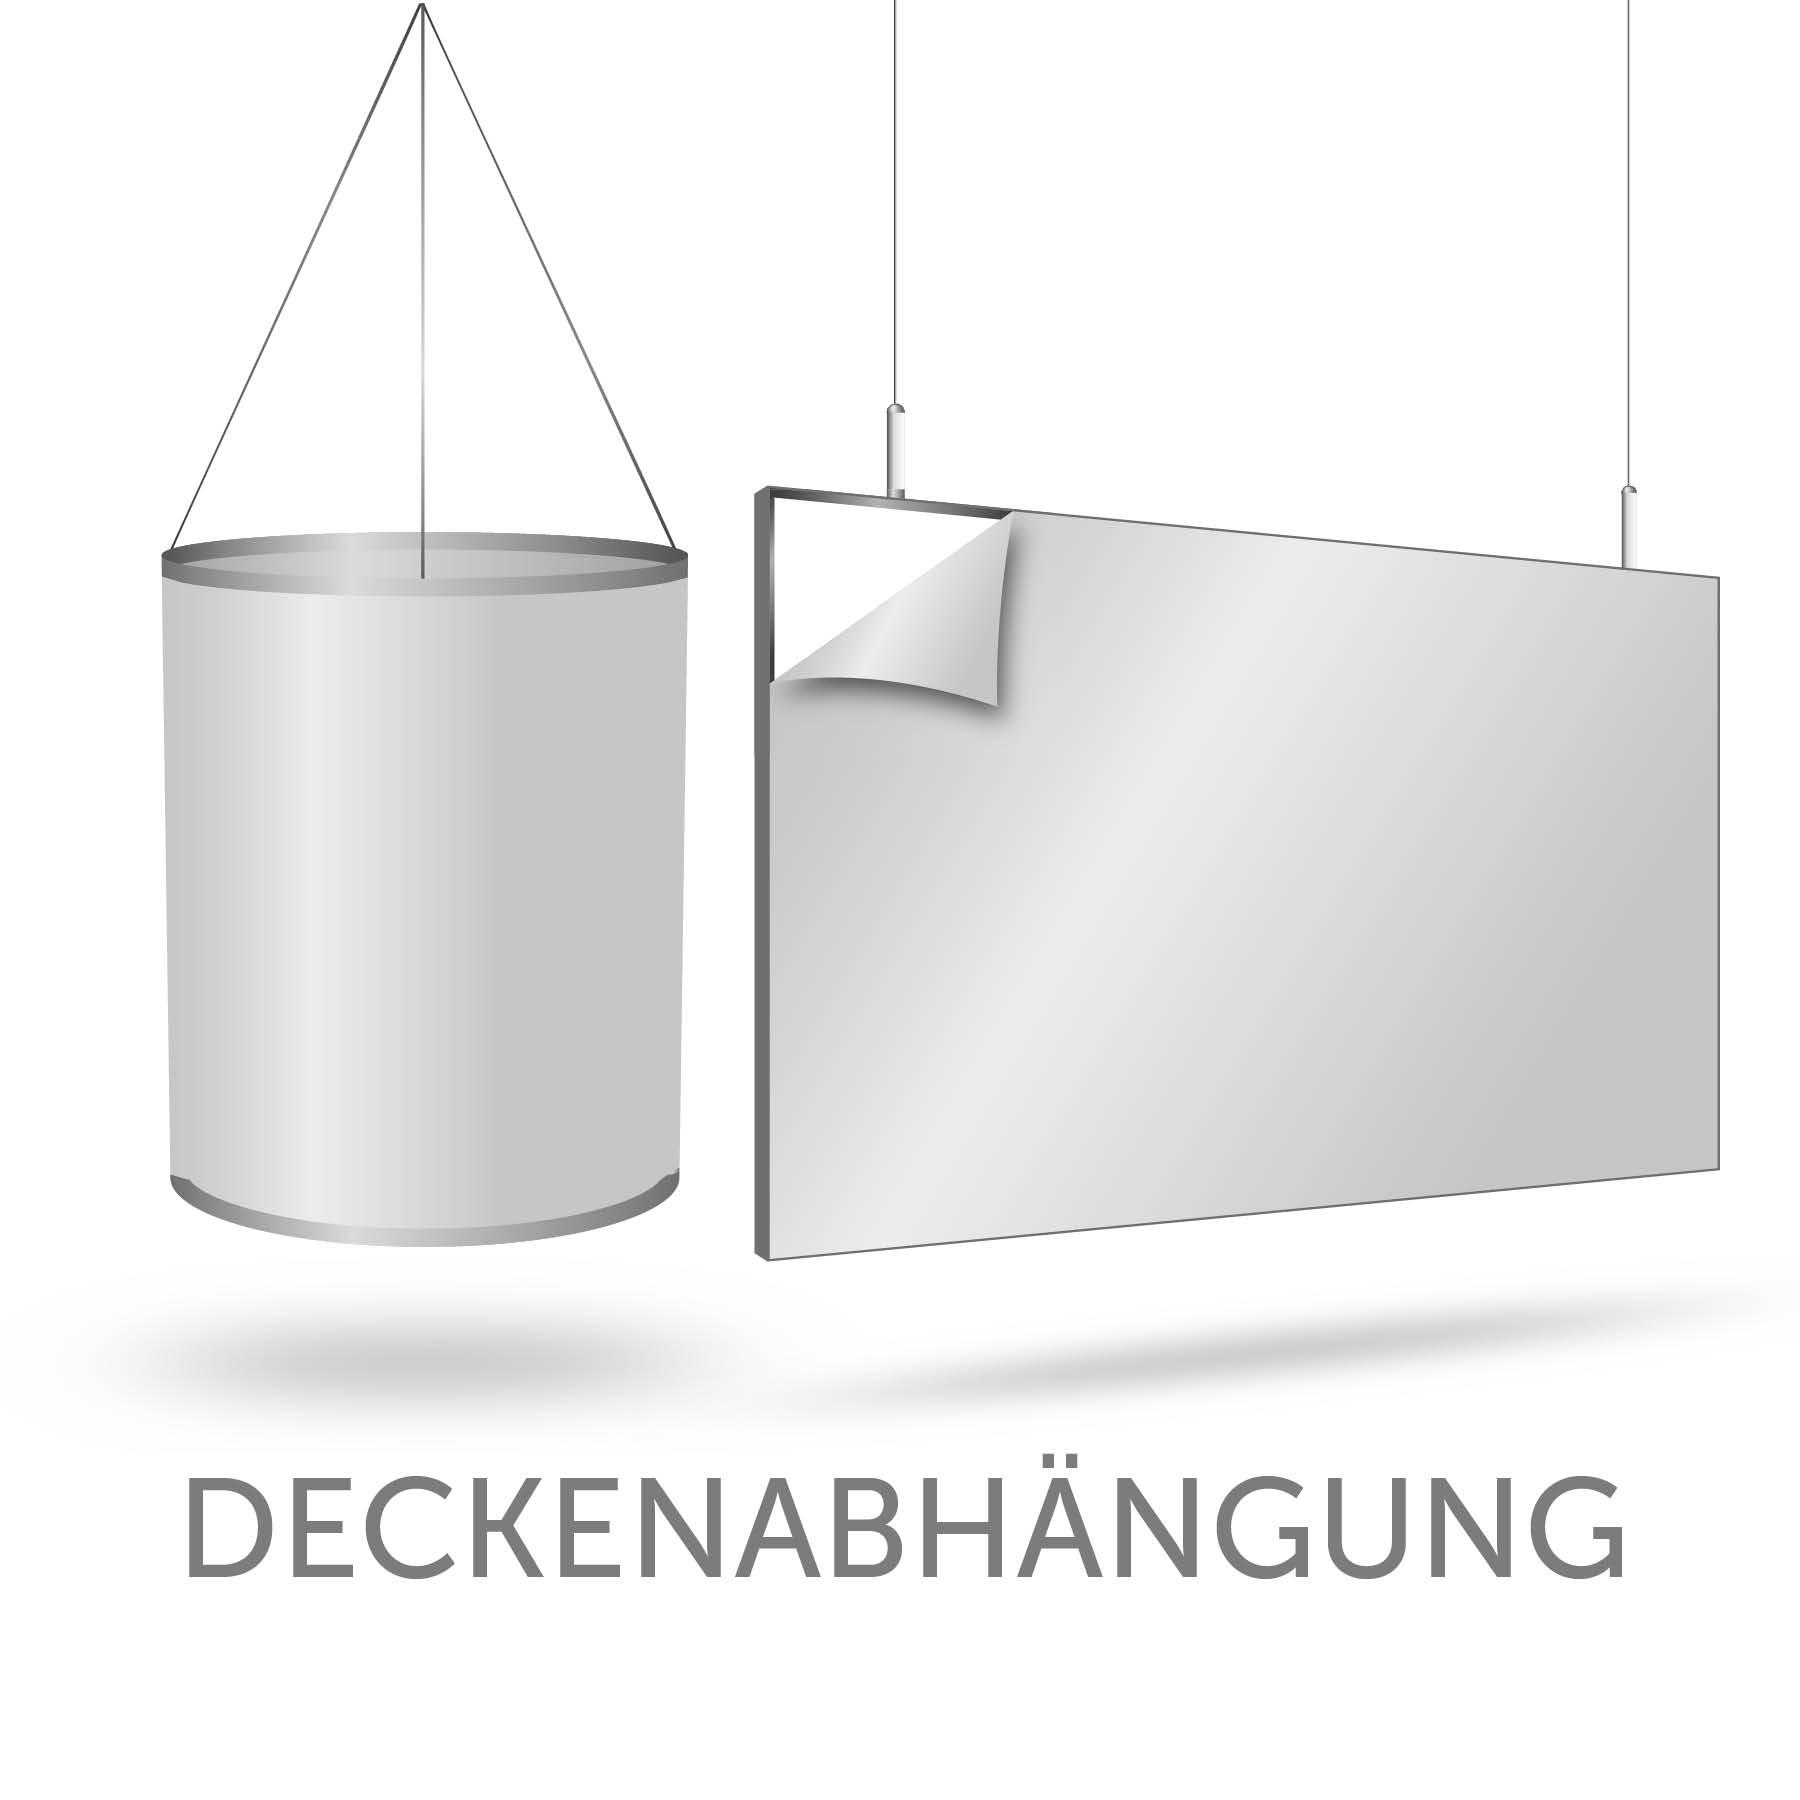 Deckenabhängung